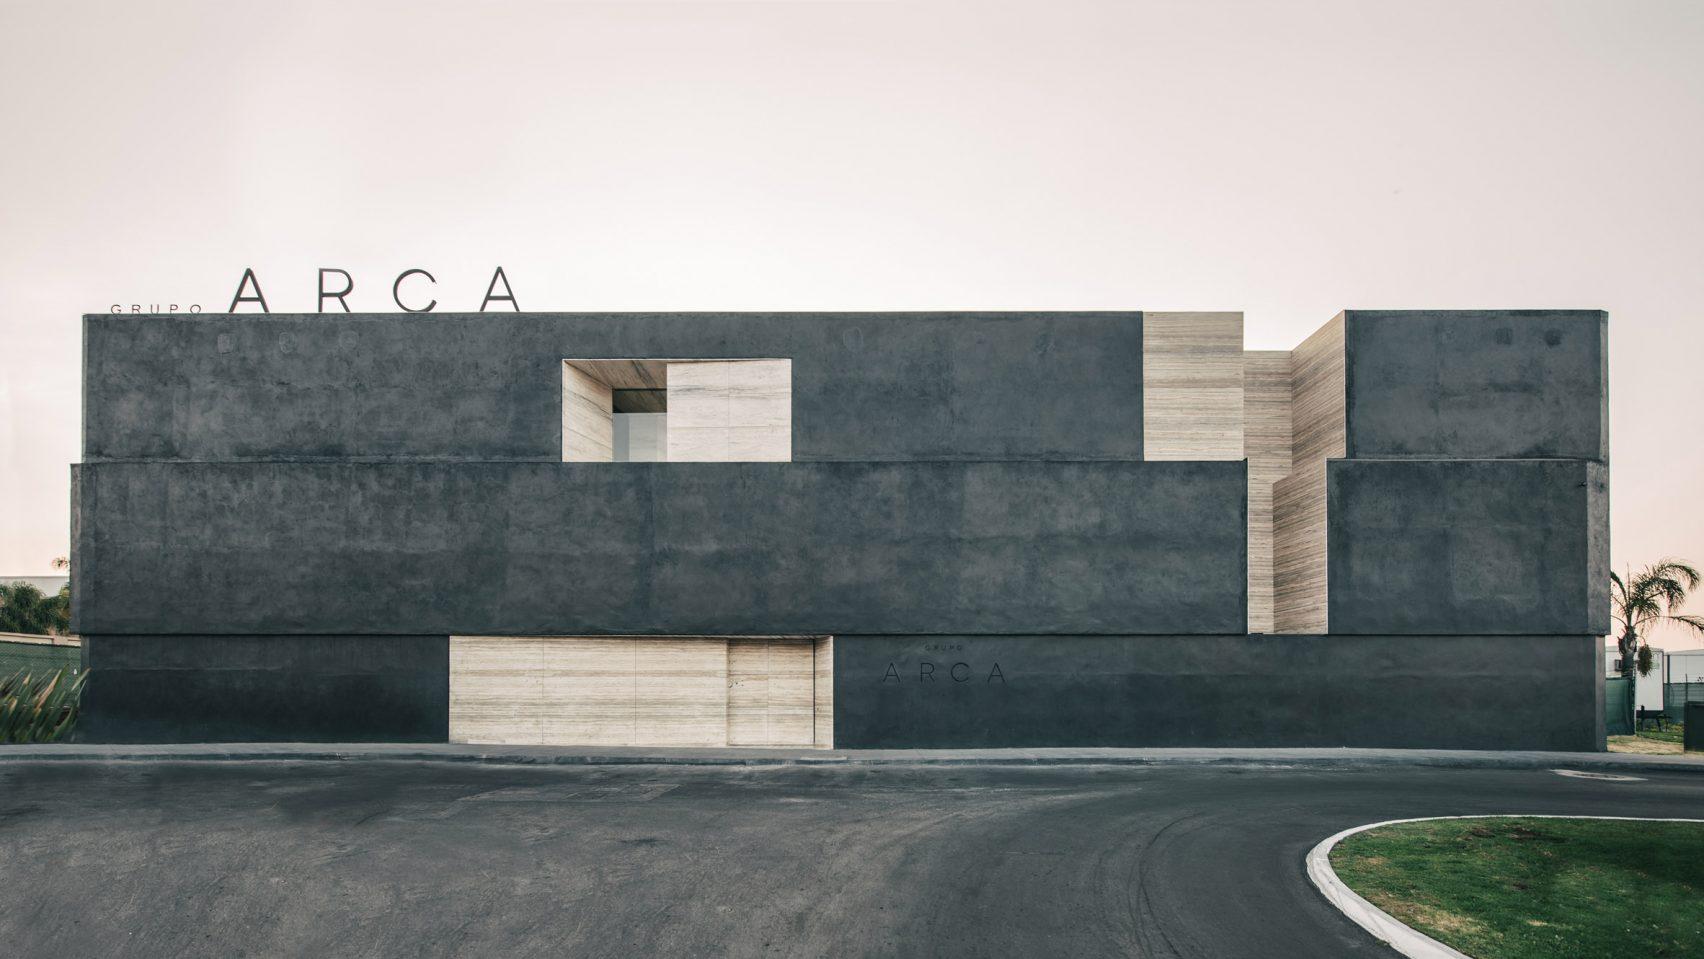 grupo-arca-showroom-store-cultural-centre-esrawe-studio-guadalajara-mexico_hero-a-1704x959